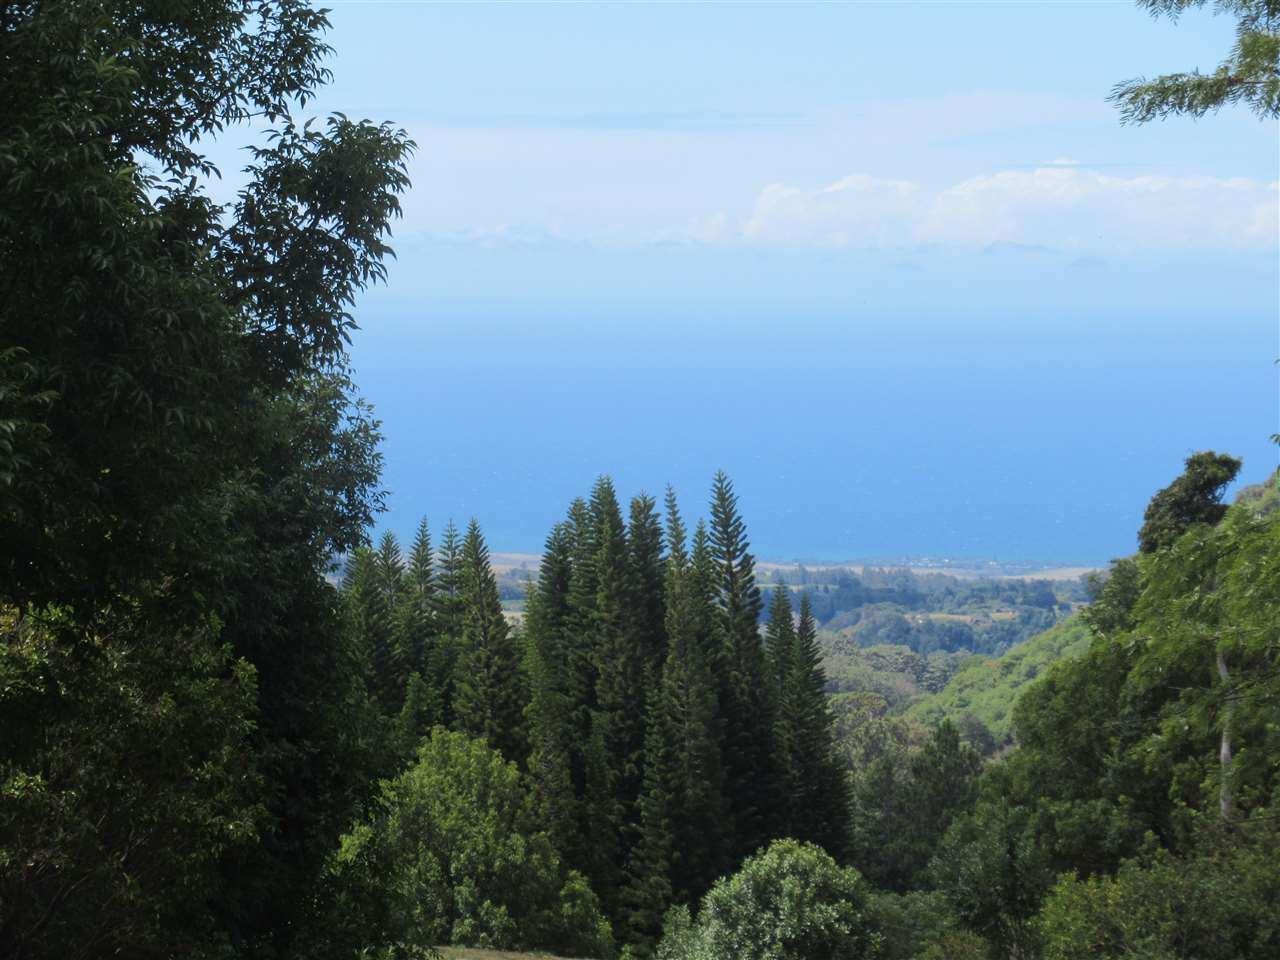 Photo of 0 Kahakapao Rd #133-A, Makawao, HI 96768 (MLS # 388586)